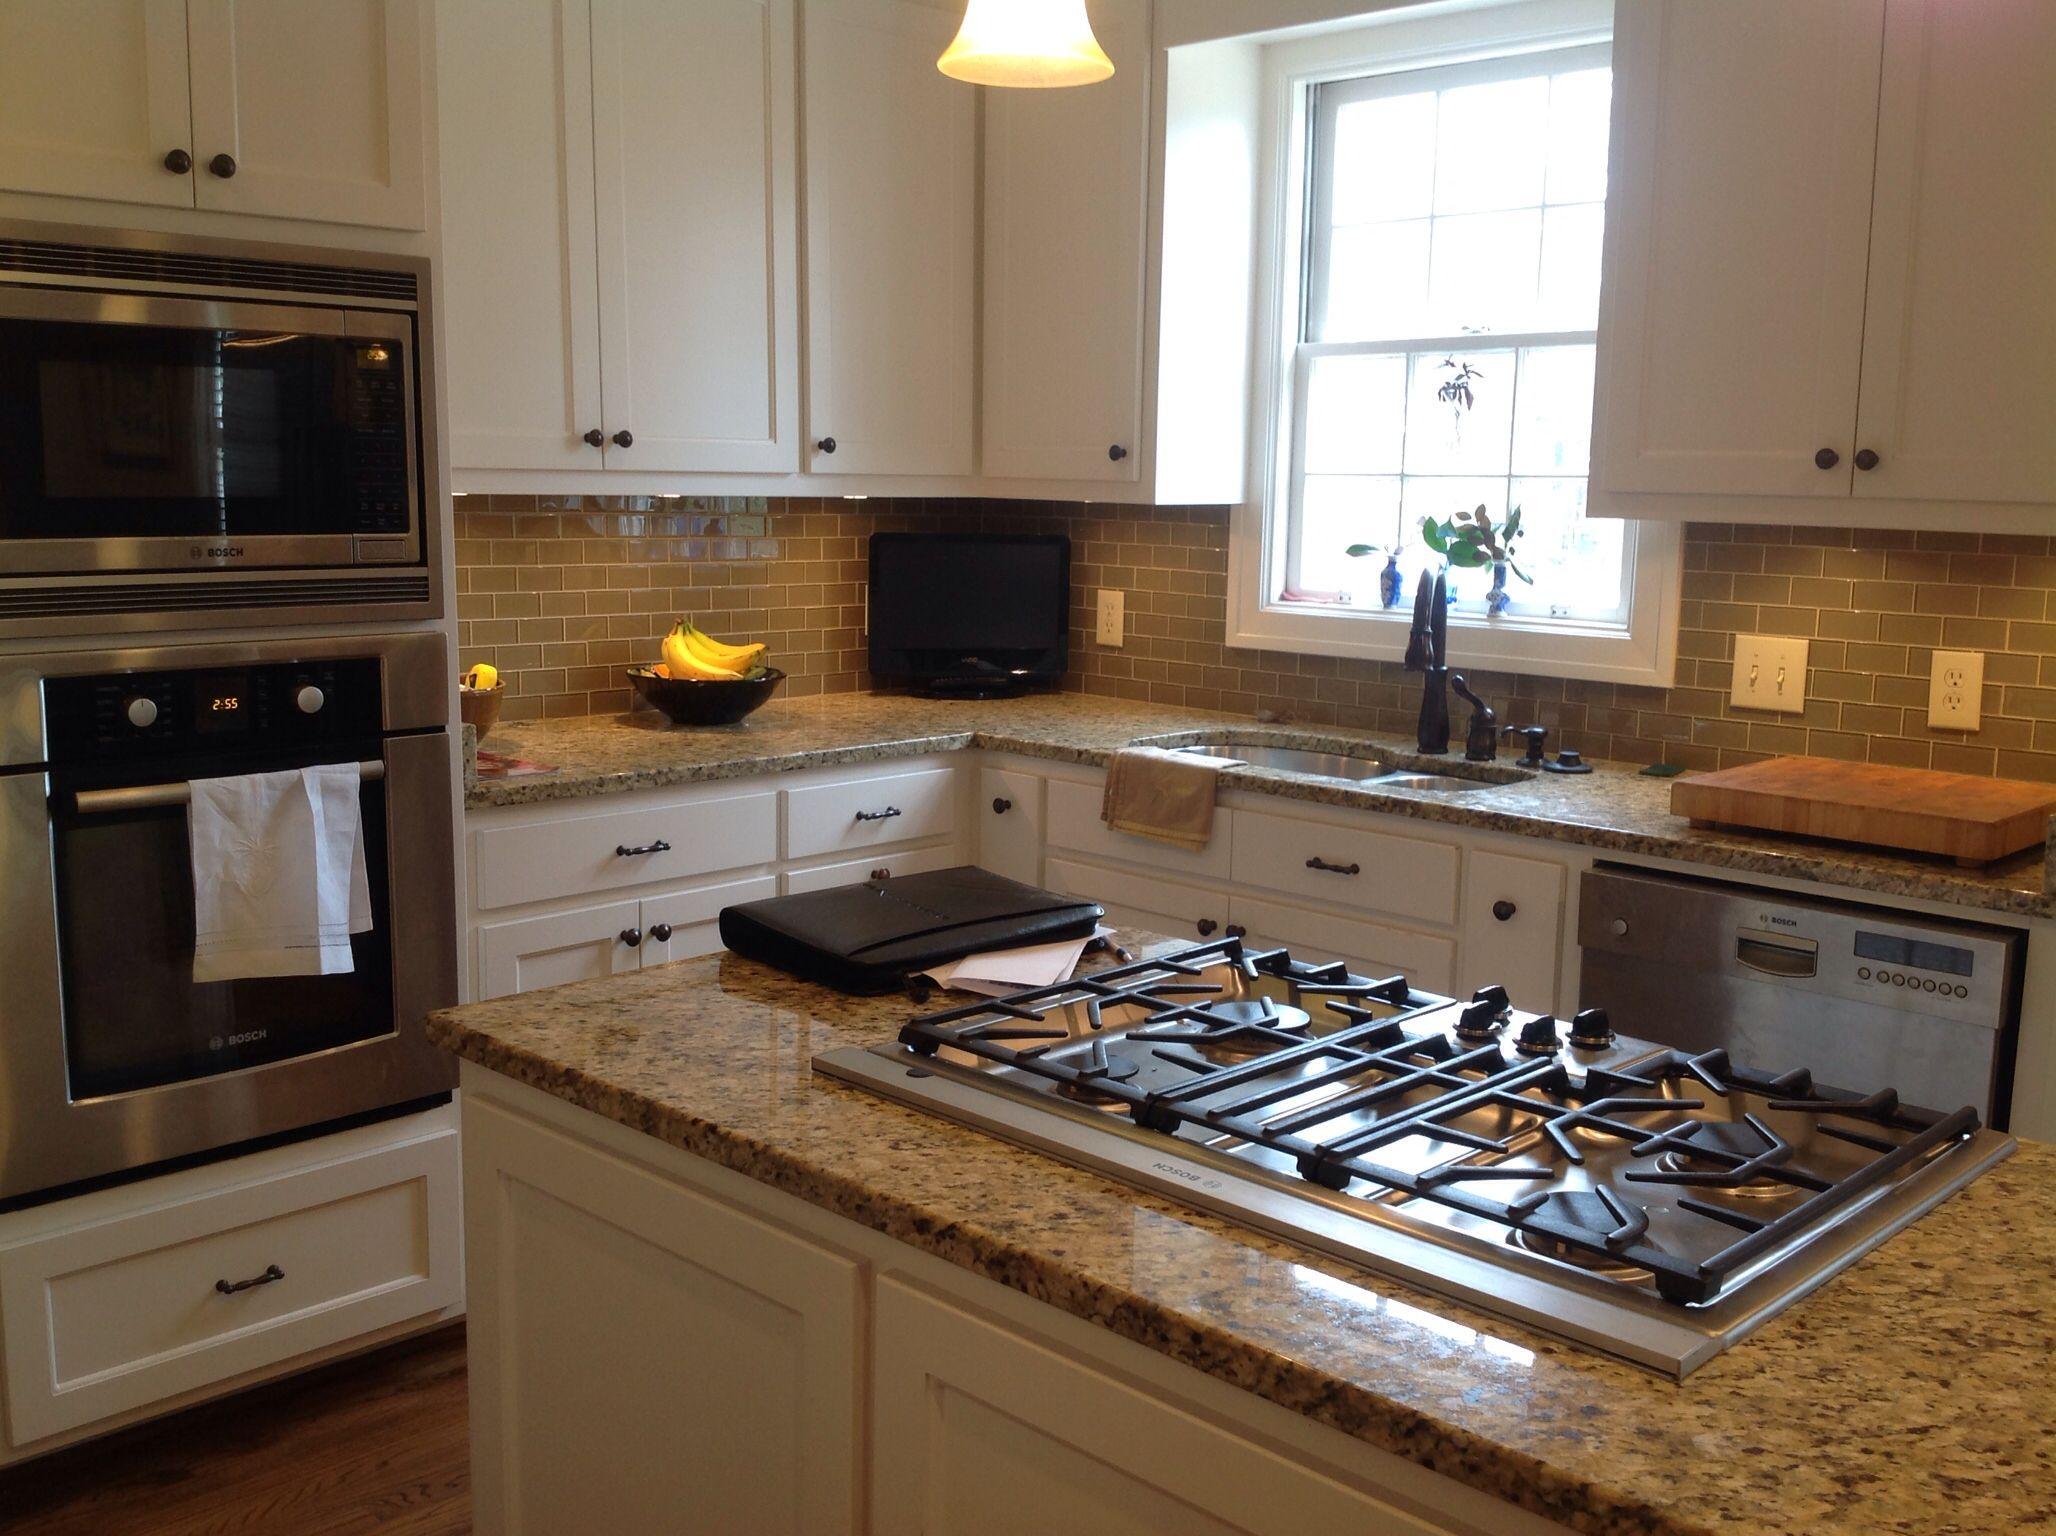 Island & backsplash | Kitchen cabinets